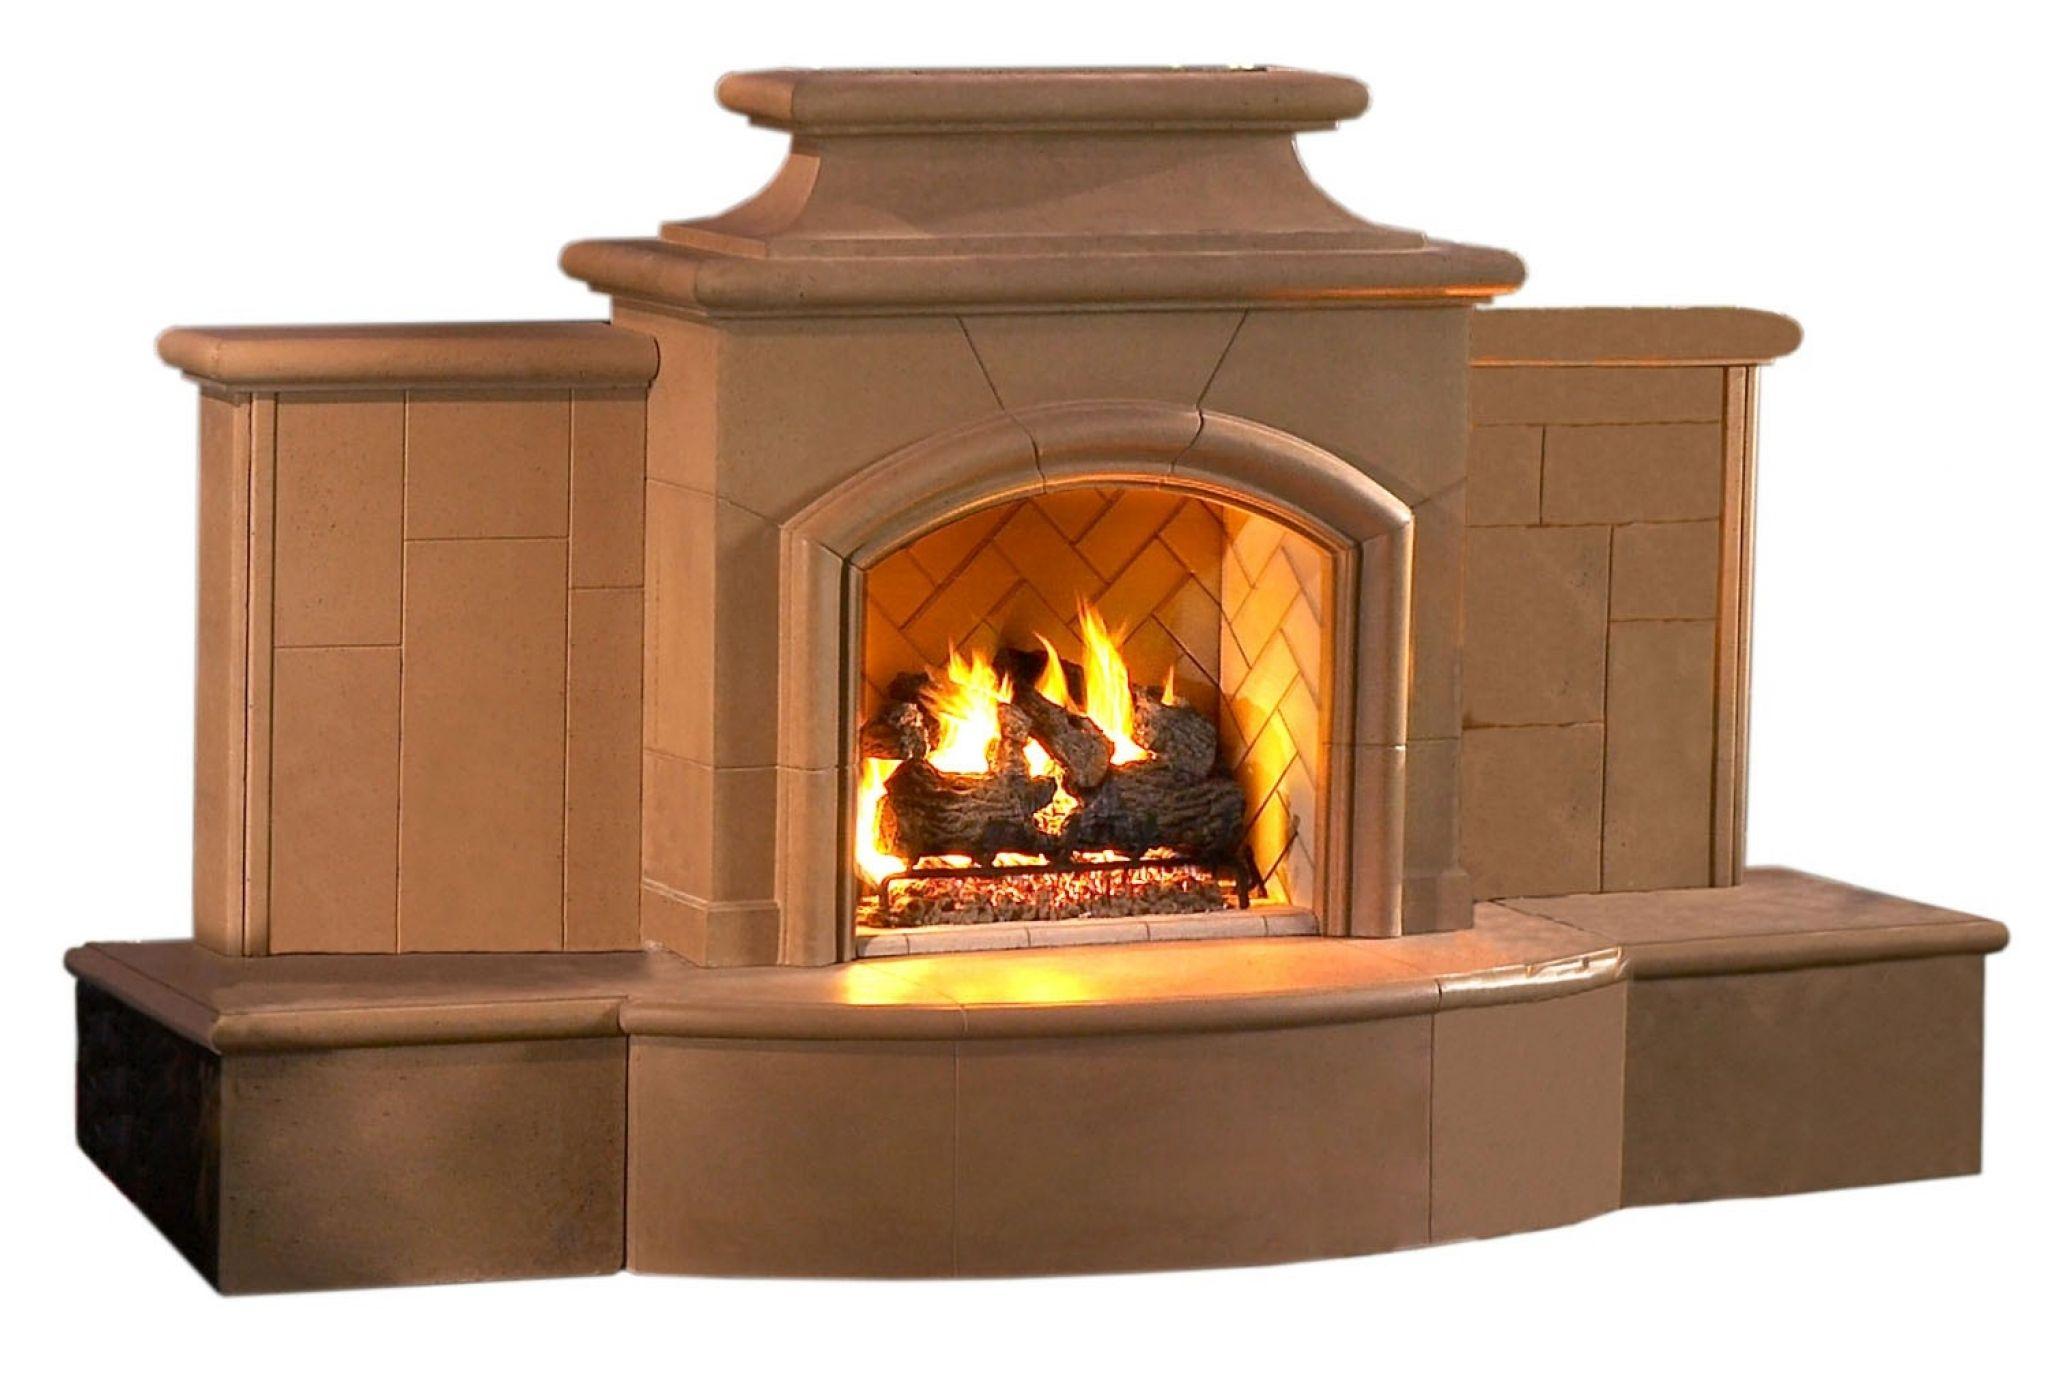 free standing outdoor gas fireplace modern interior